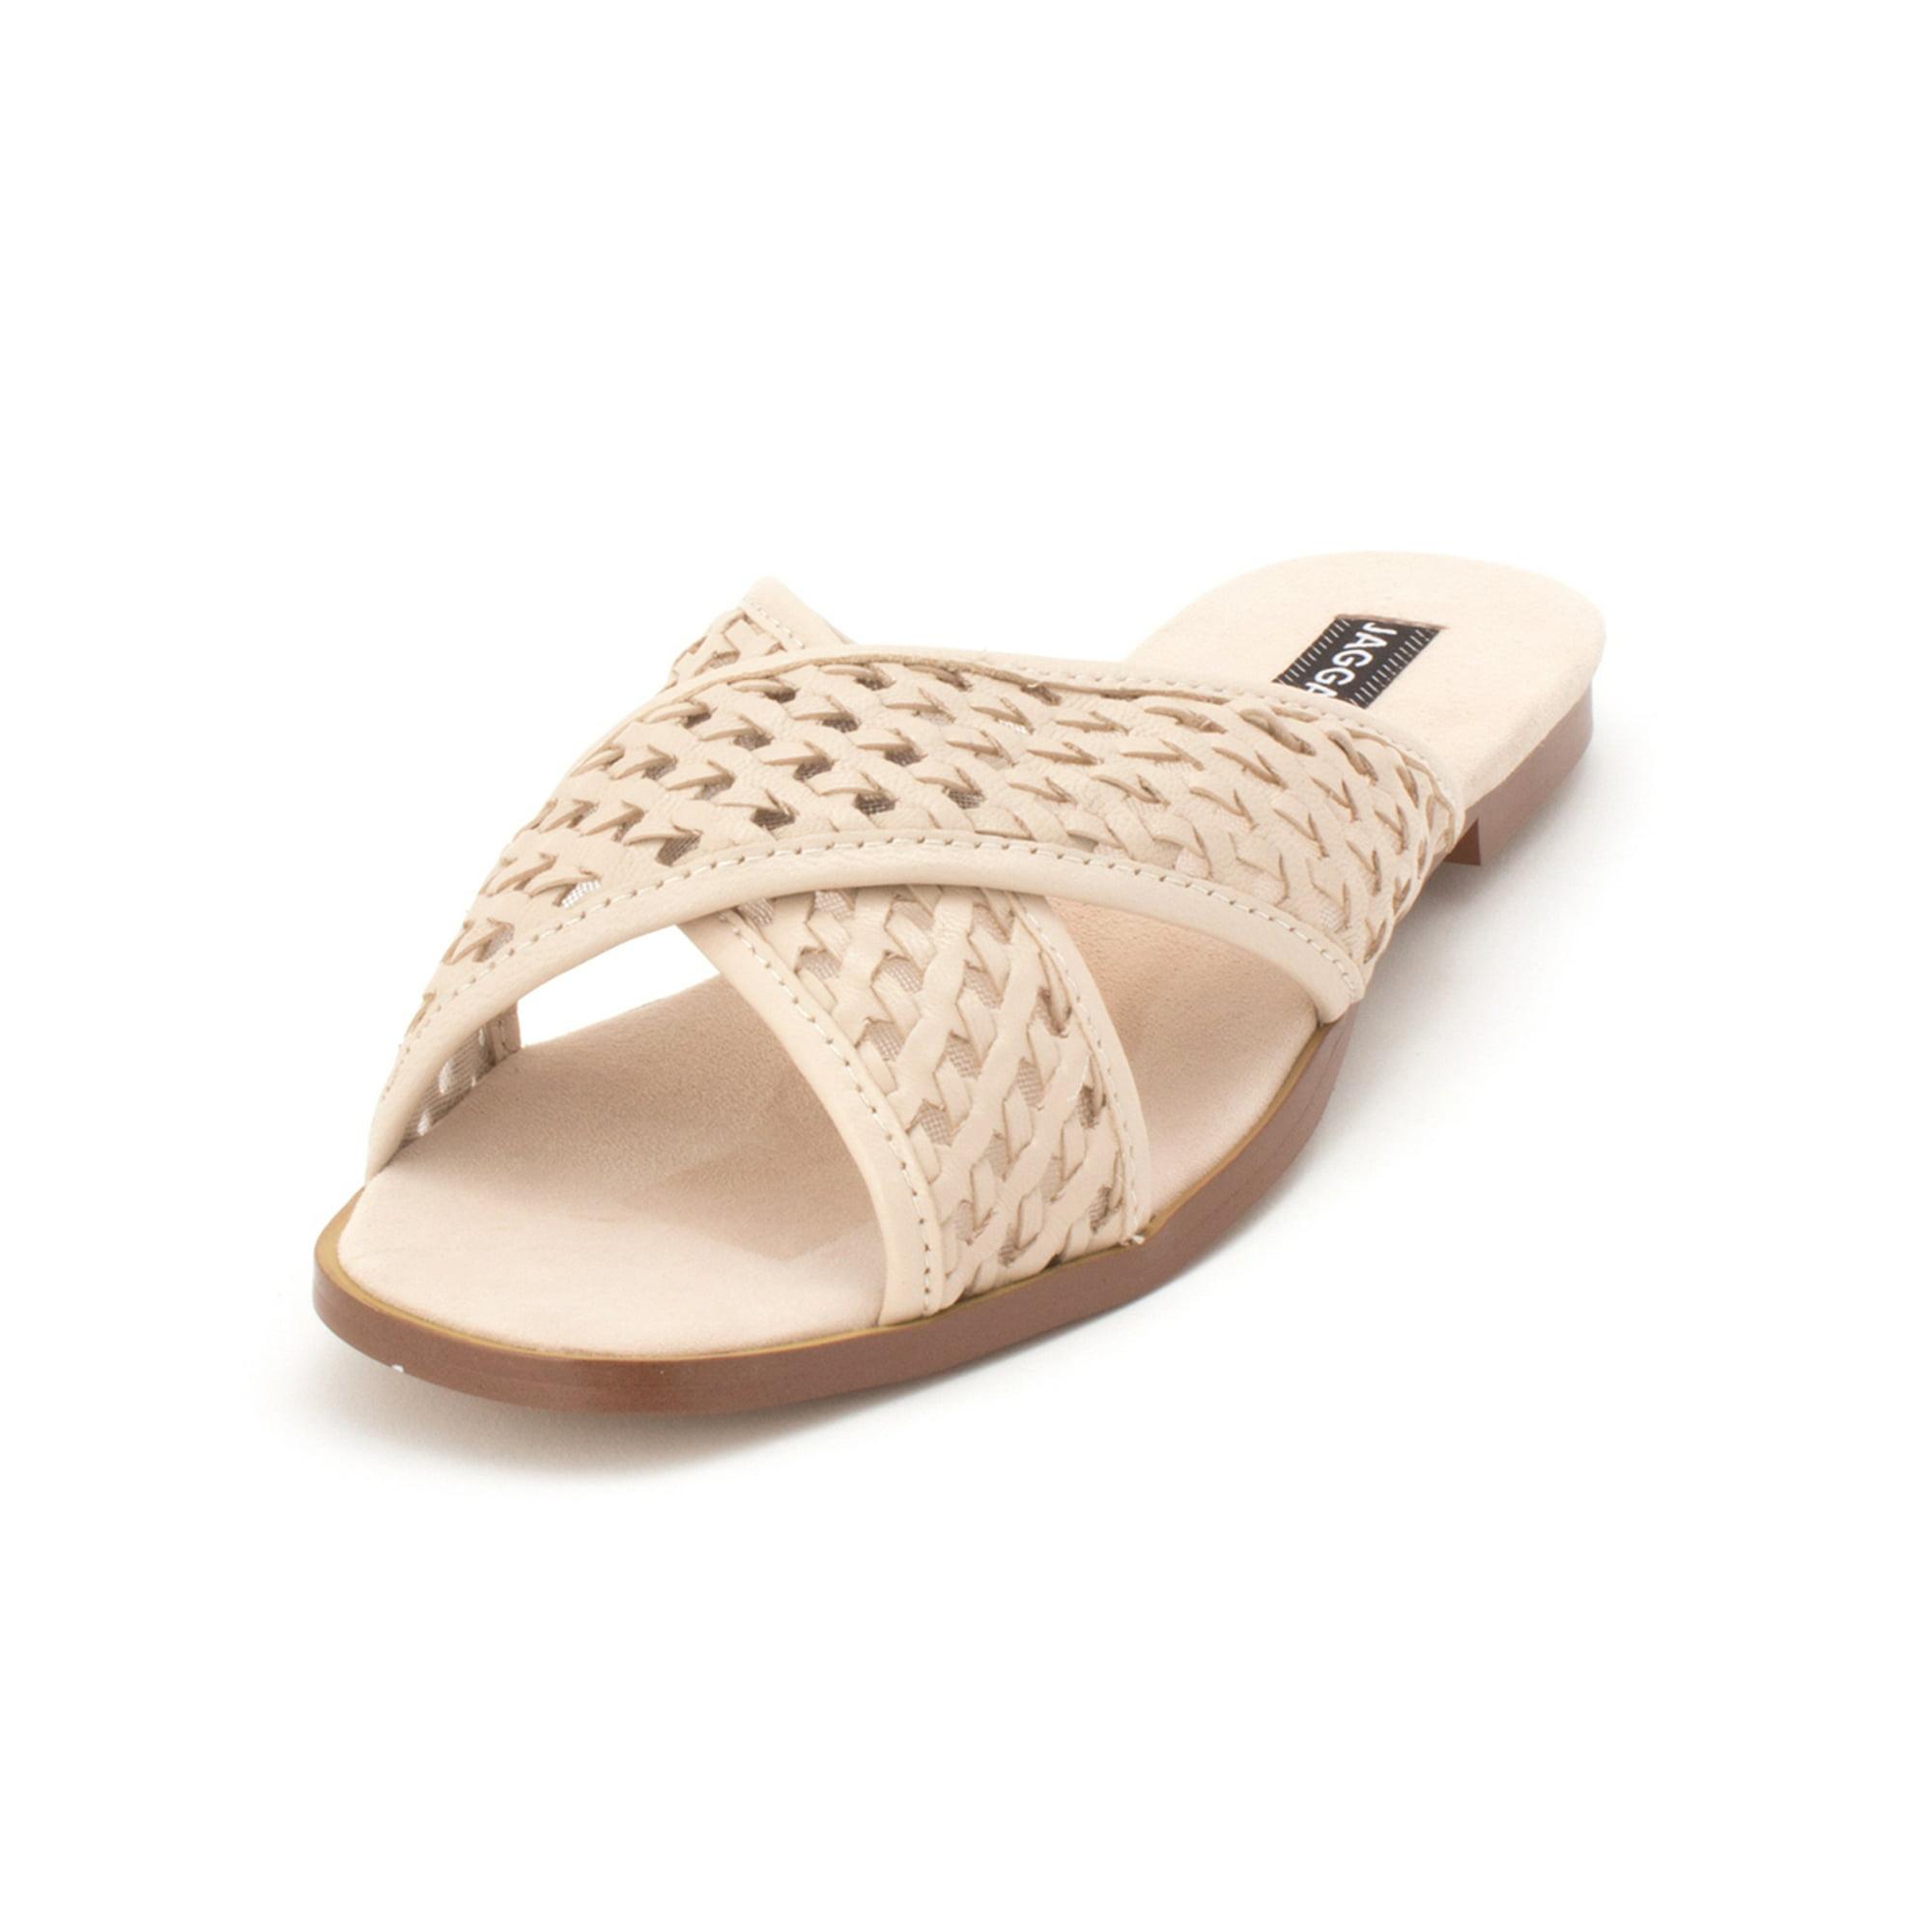 43c640581 JAGGAR Womens Crossrd Flat Leather Open Toe Casual Slide Sandals ...